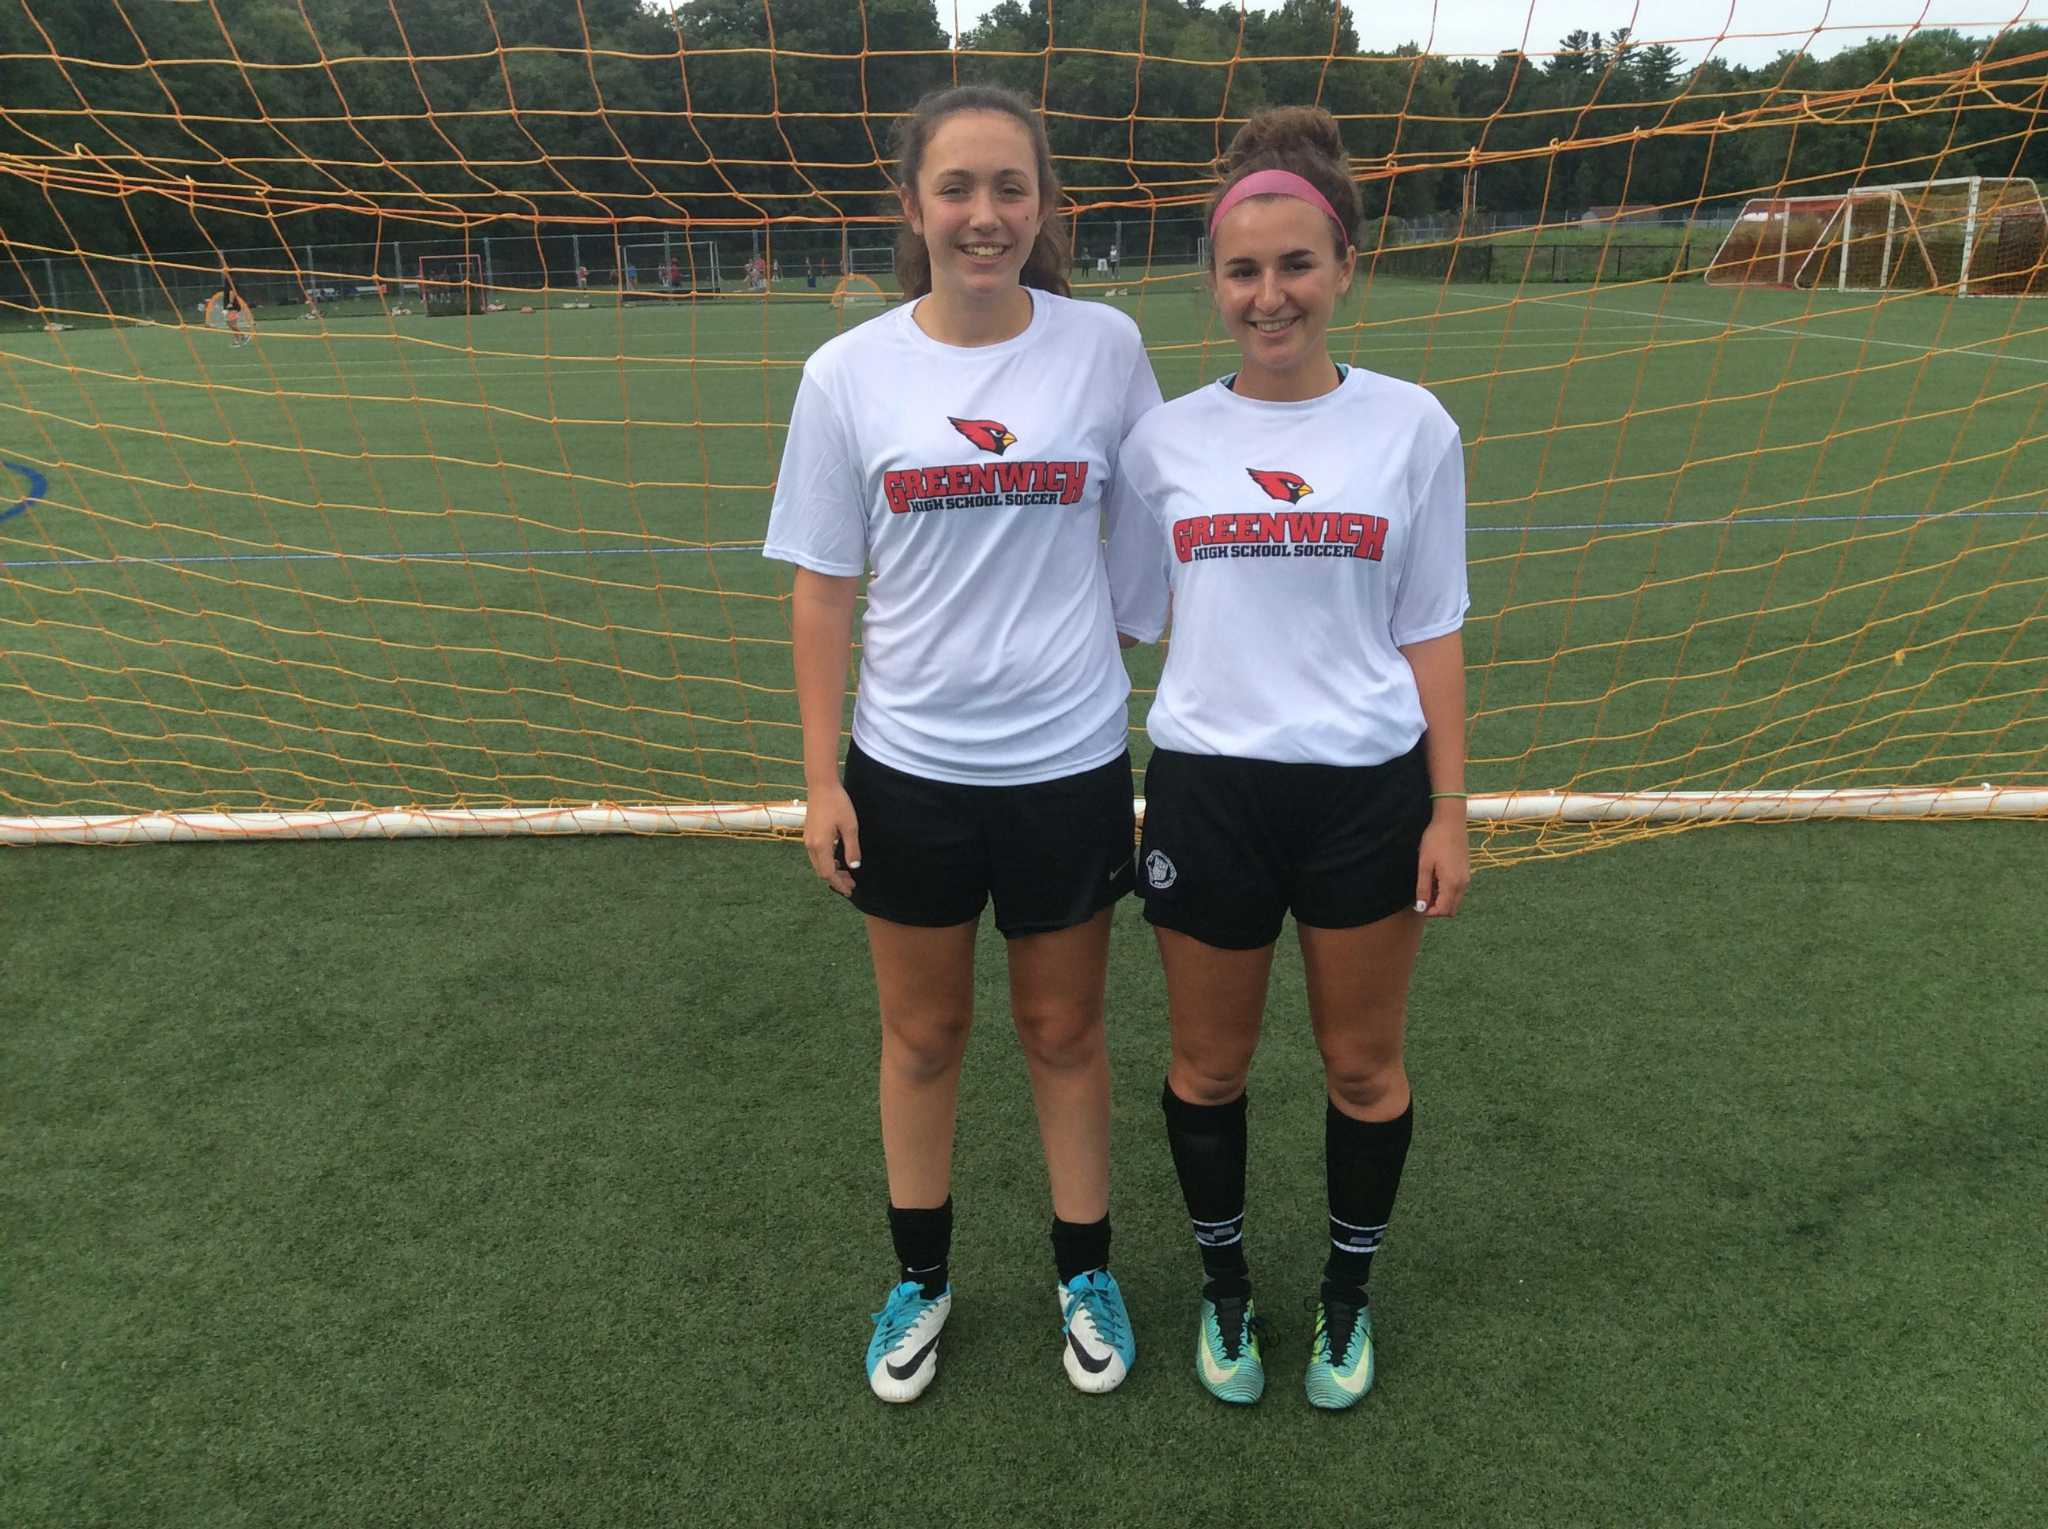 Greenwich Girls Soccer Team Enters Season With Plenty Of Optimism Greenwichtime